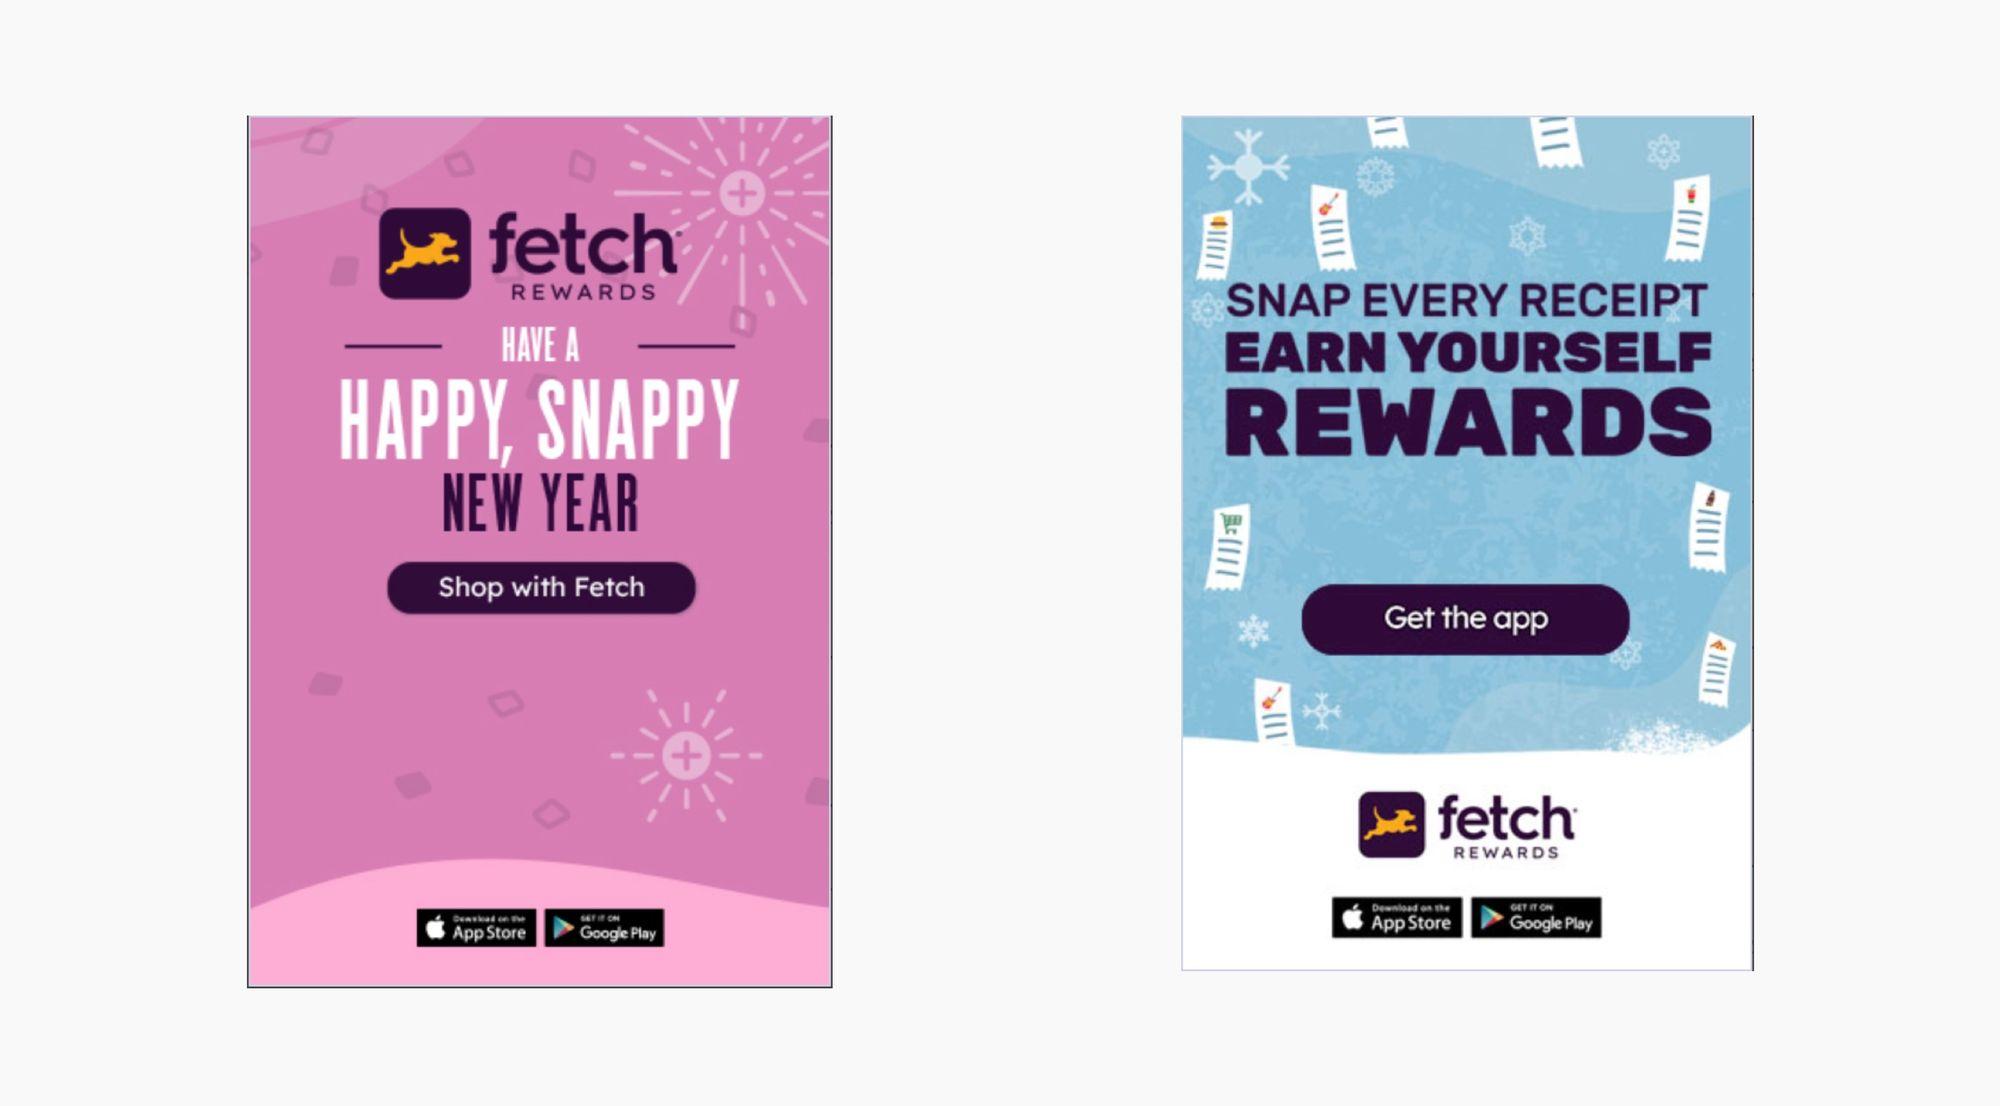 Fetch Rewards ads built with Dynamic Ads